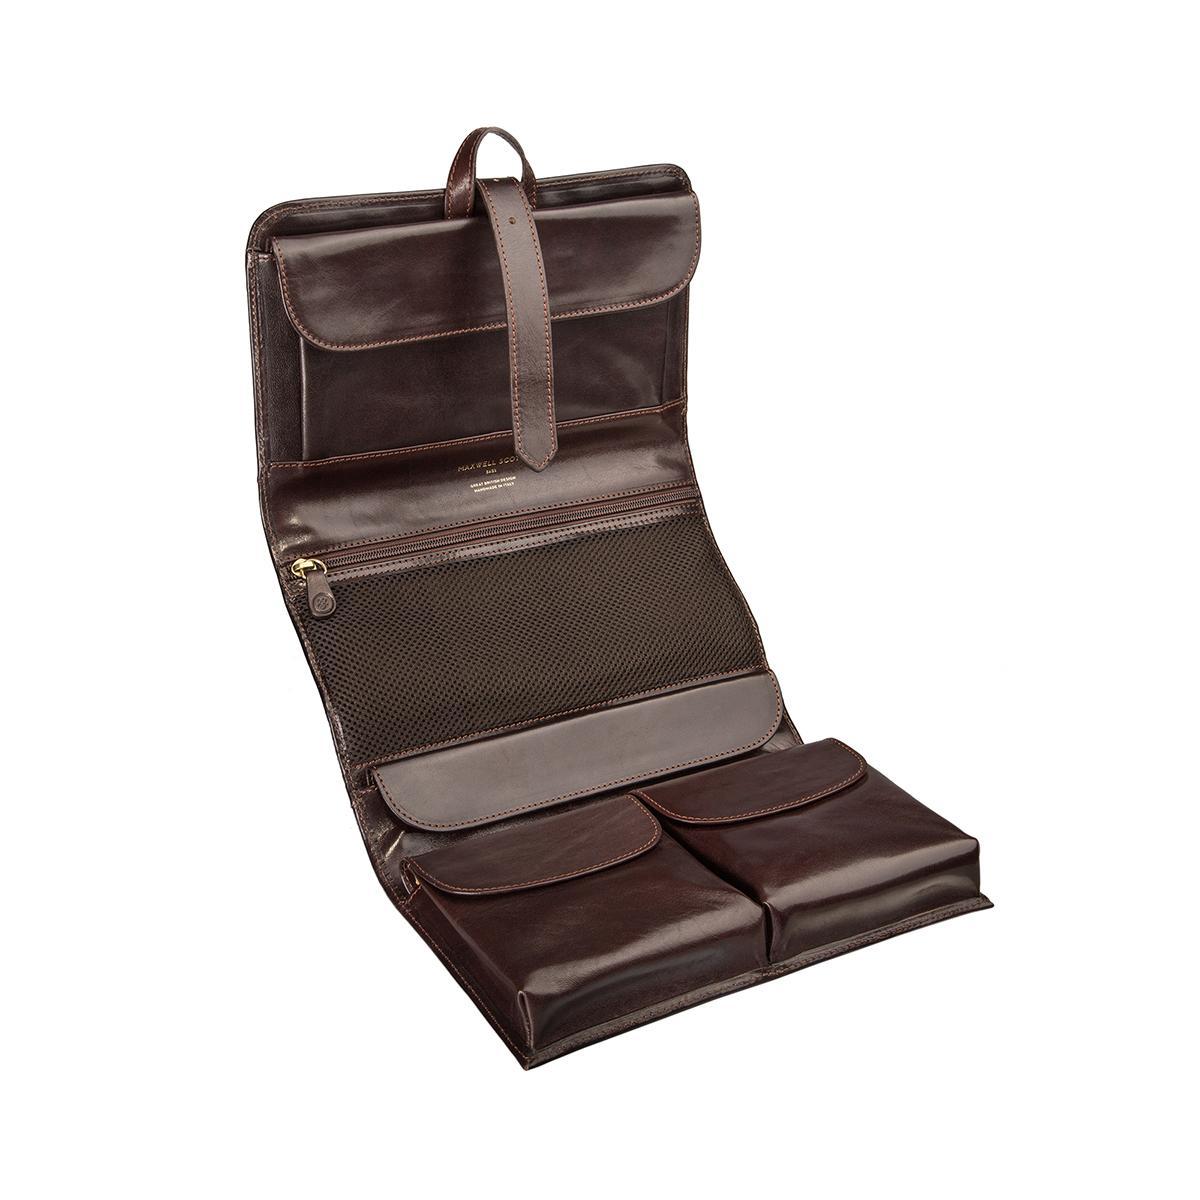 maxwell scott bags luxus leder kulturbeutel in dunkelbraun pratello. Black Bedroom Furniture Sets. Home Design Ideas